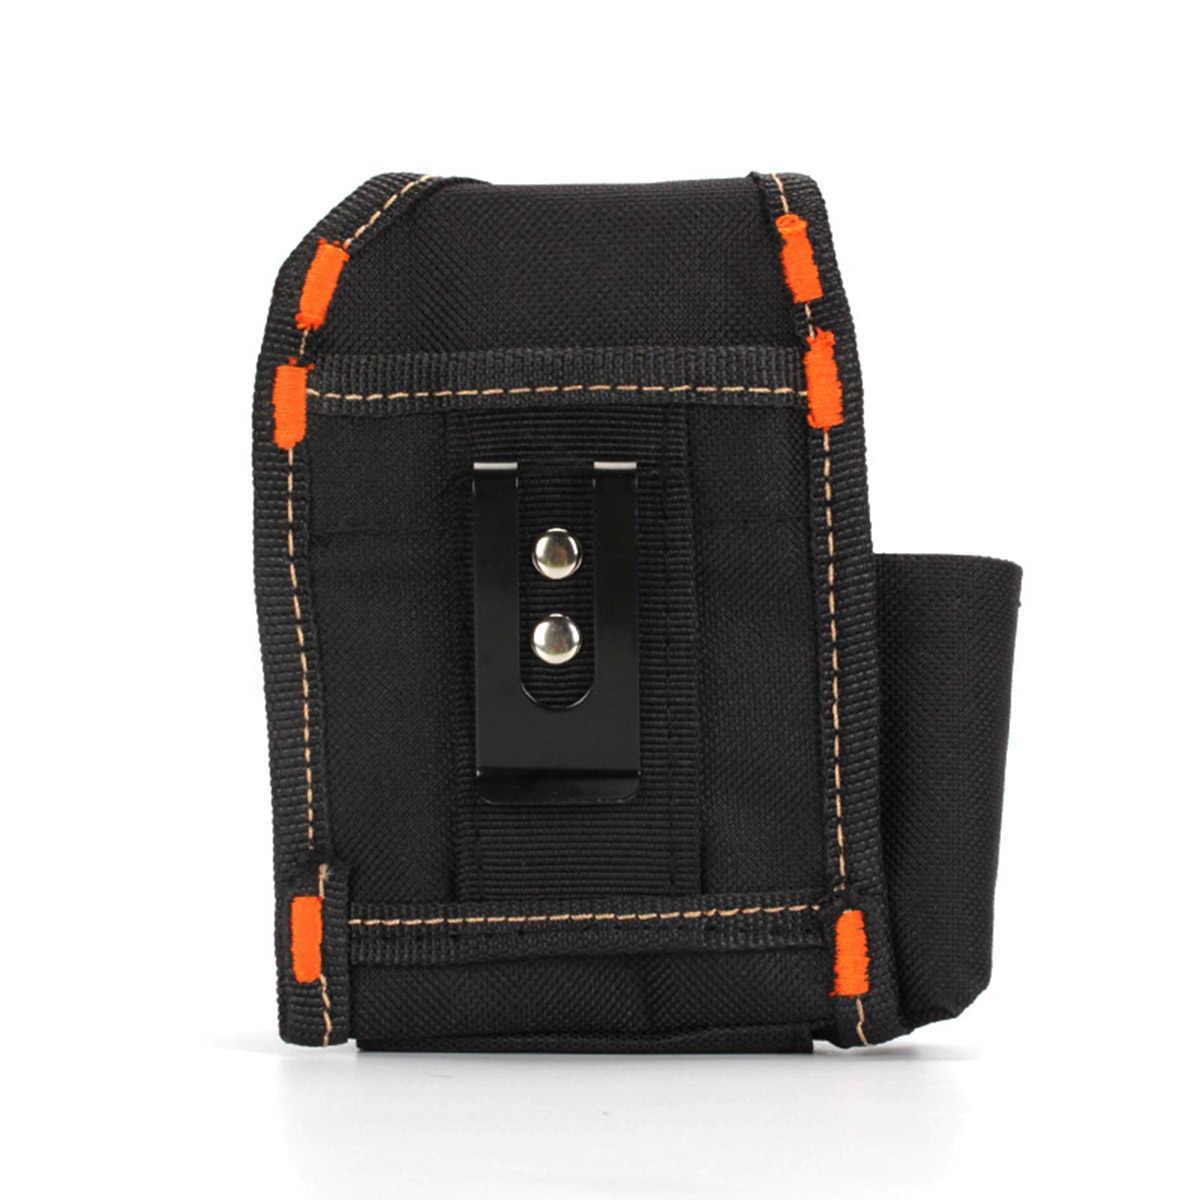 Mini Sacchetto Della Vita Tasca Vape Sigaretta Elettronica Sacchetto per Box Mod Rda Kit Vs Ud Vape Sacchetto X9 Borsa per Il Trasporto